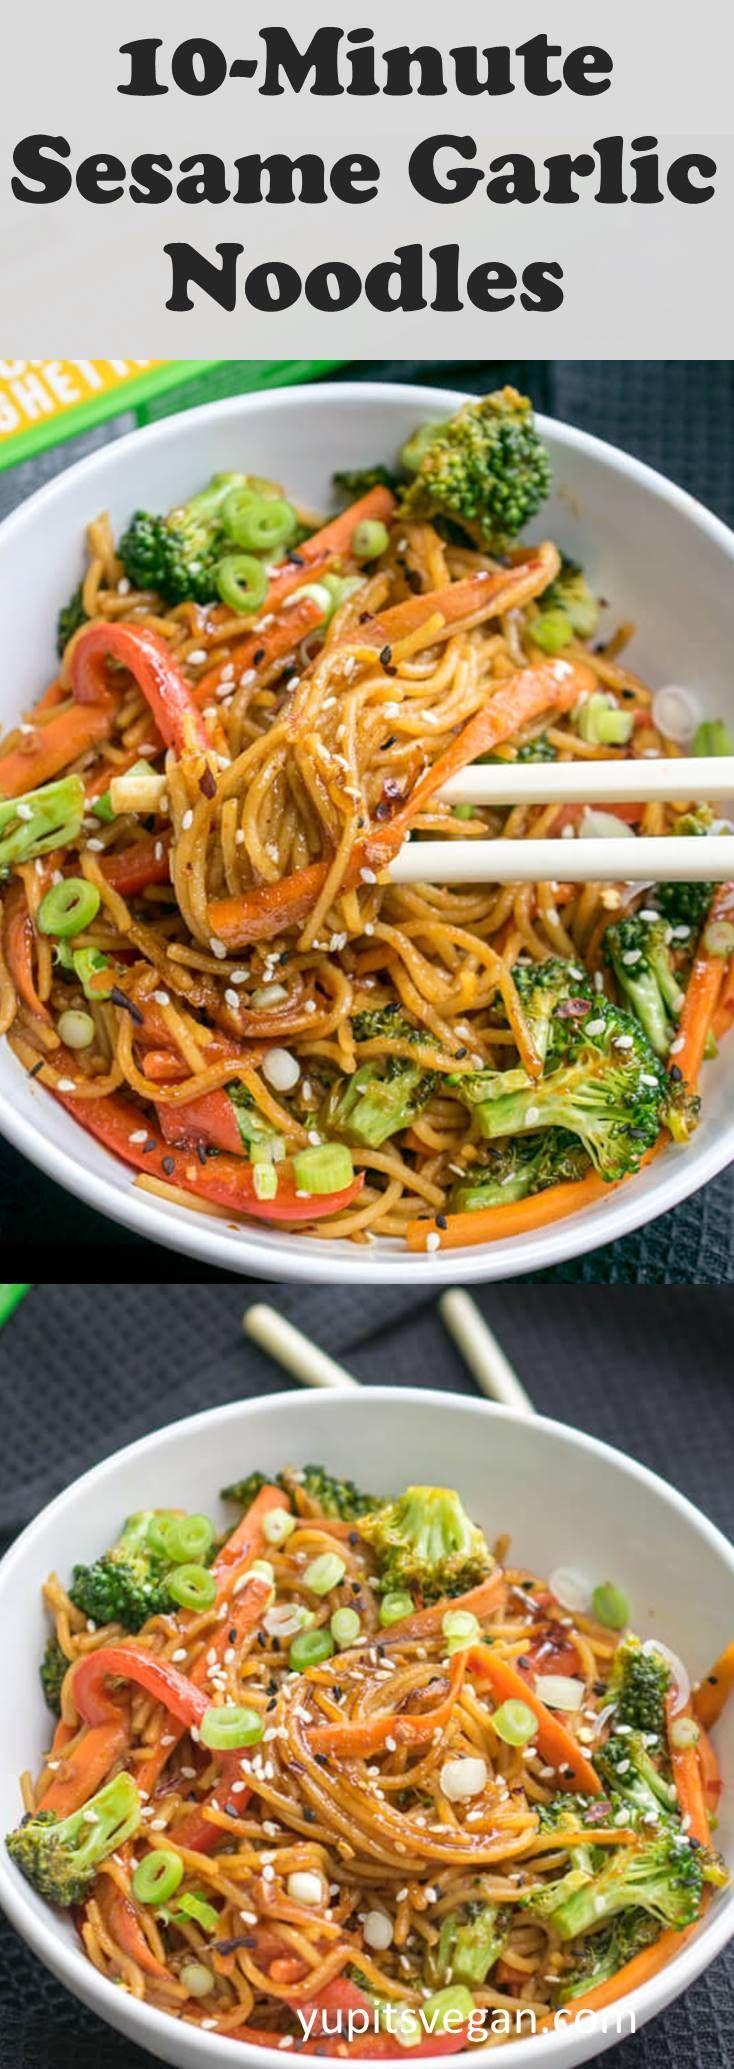 10-Minute Sesame Garlic Protein Noodles! Totally vegan, gluten-free, ready in 10…